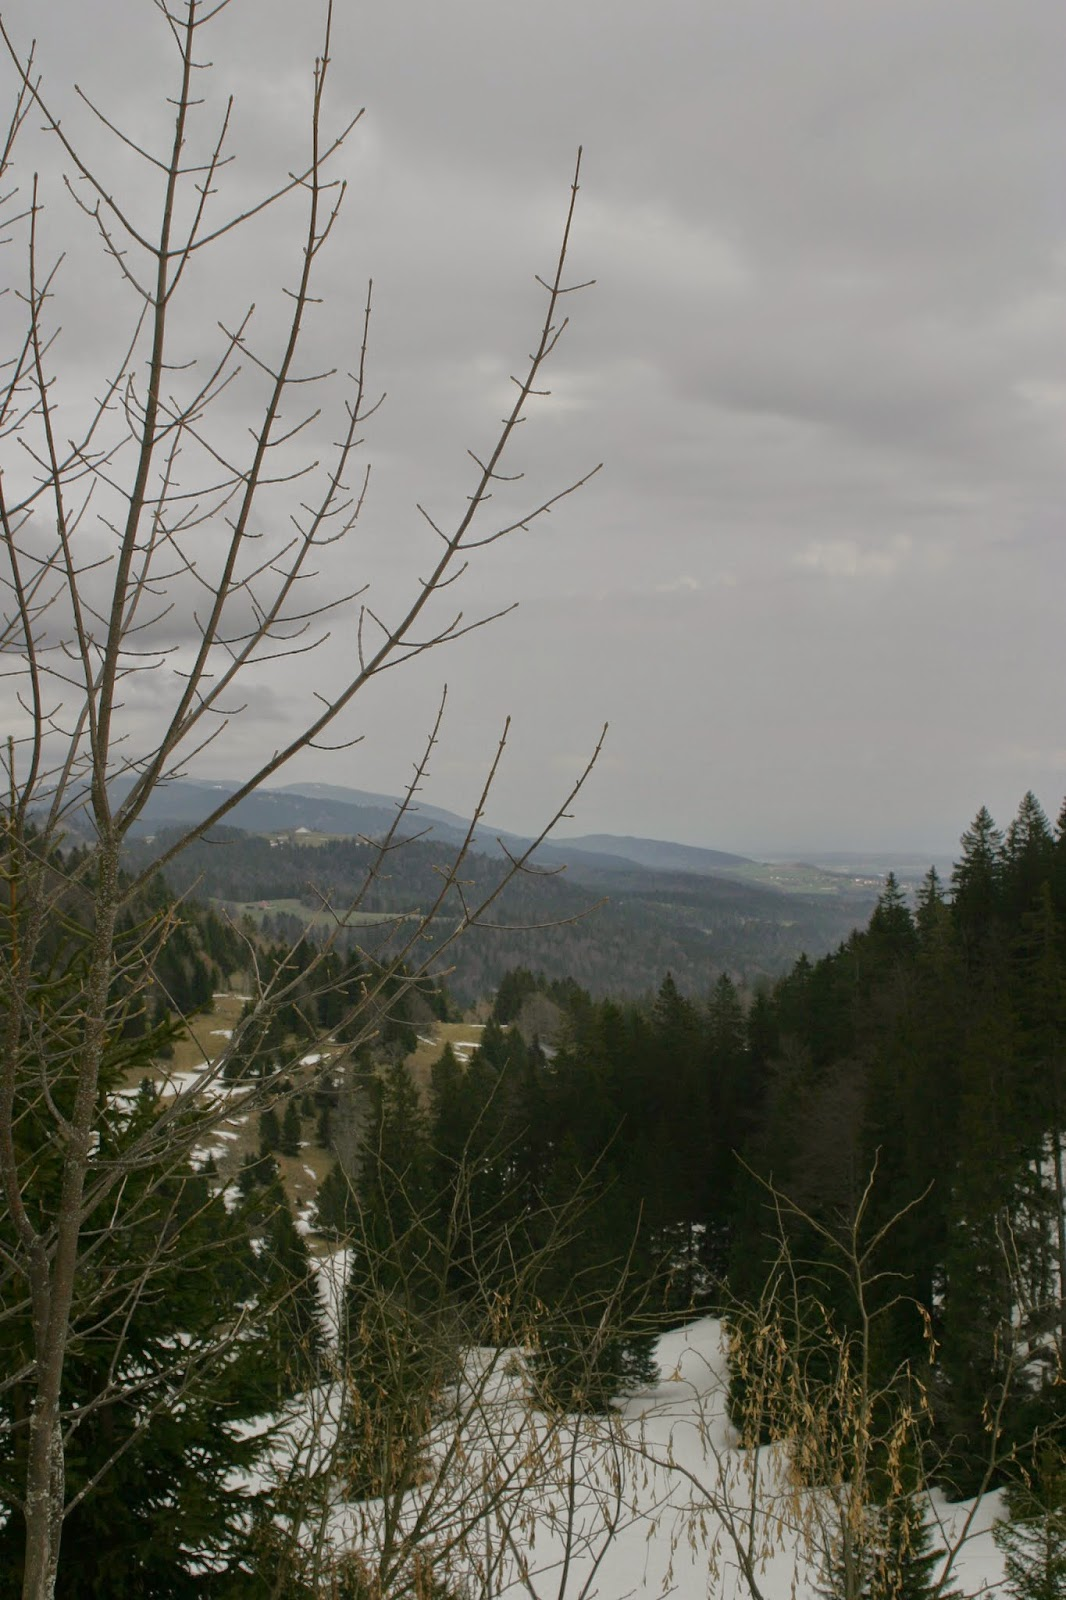 The Walk from St Cergue to La Dole by Stefan Orlowski